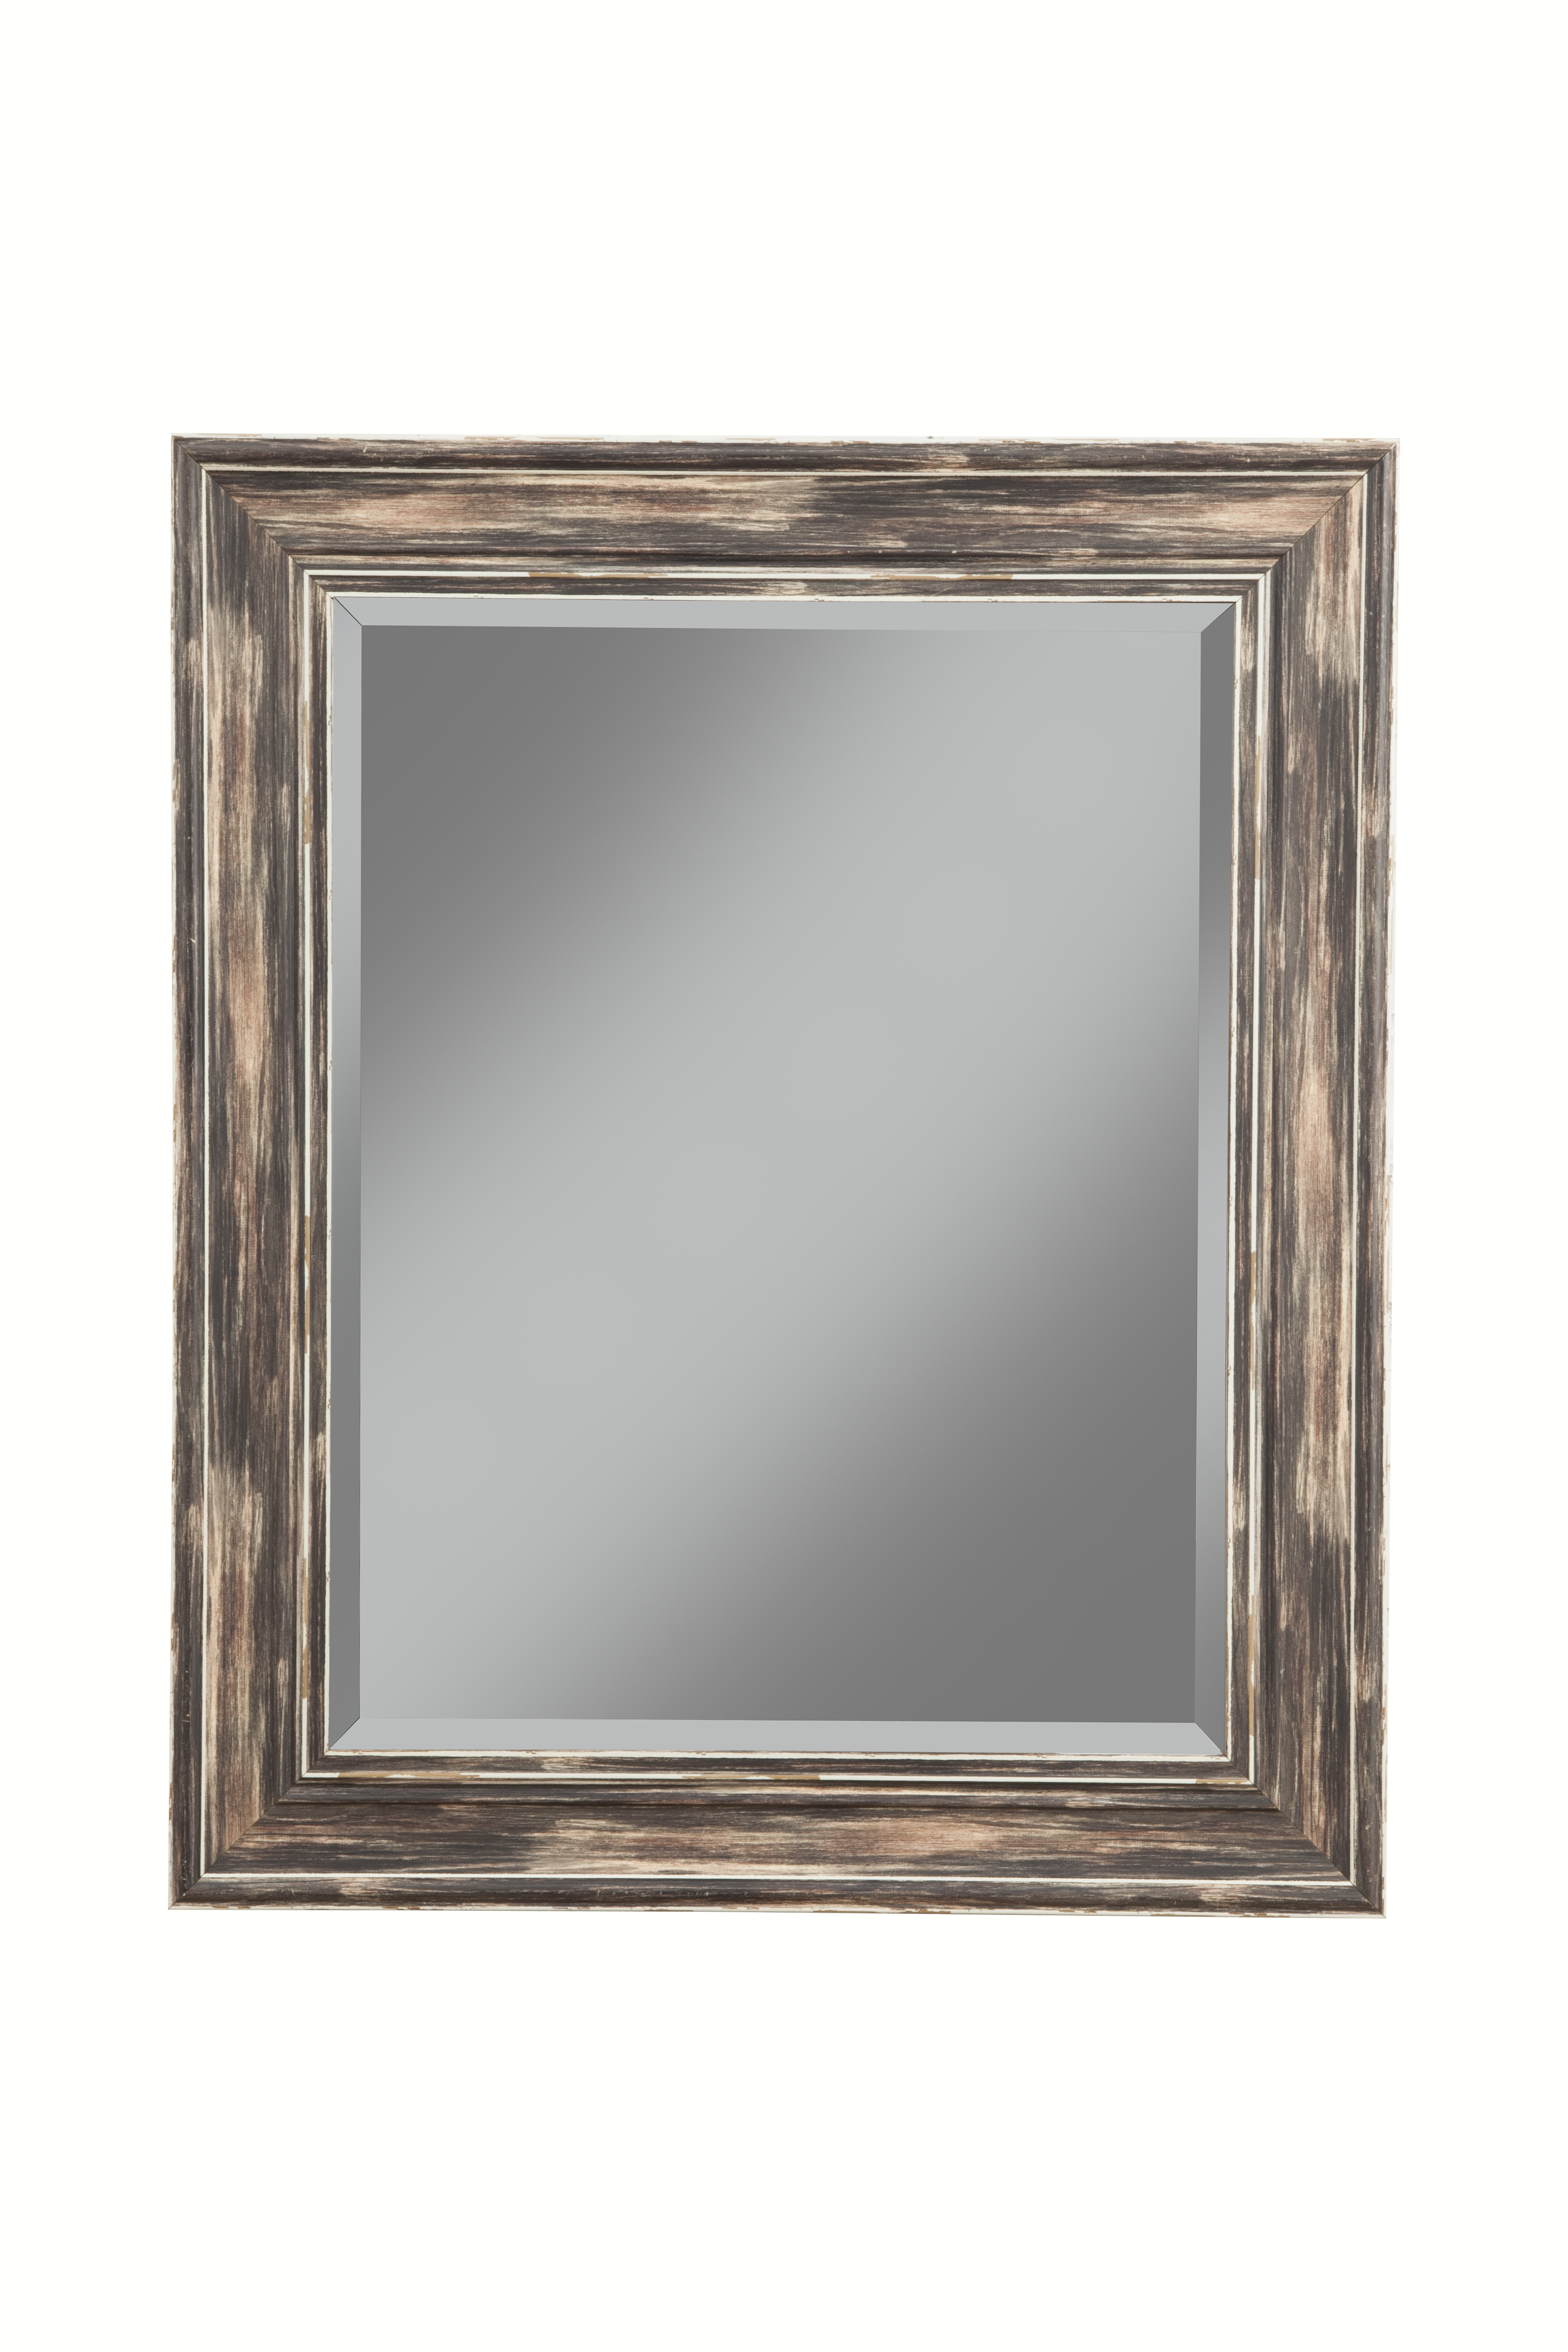 Farmhouse Antique Black Wall Mirror by Sandberg Furniture